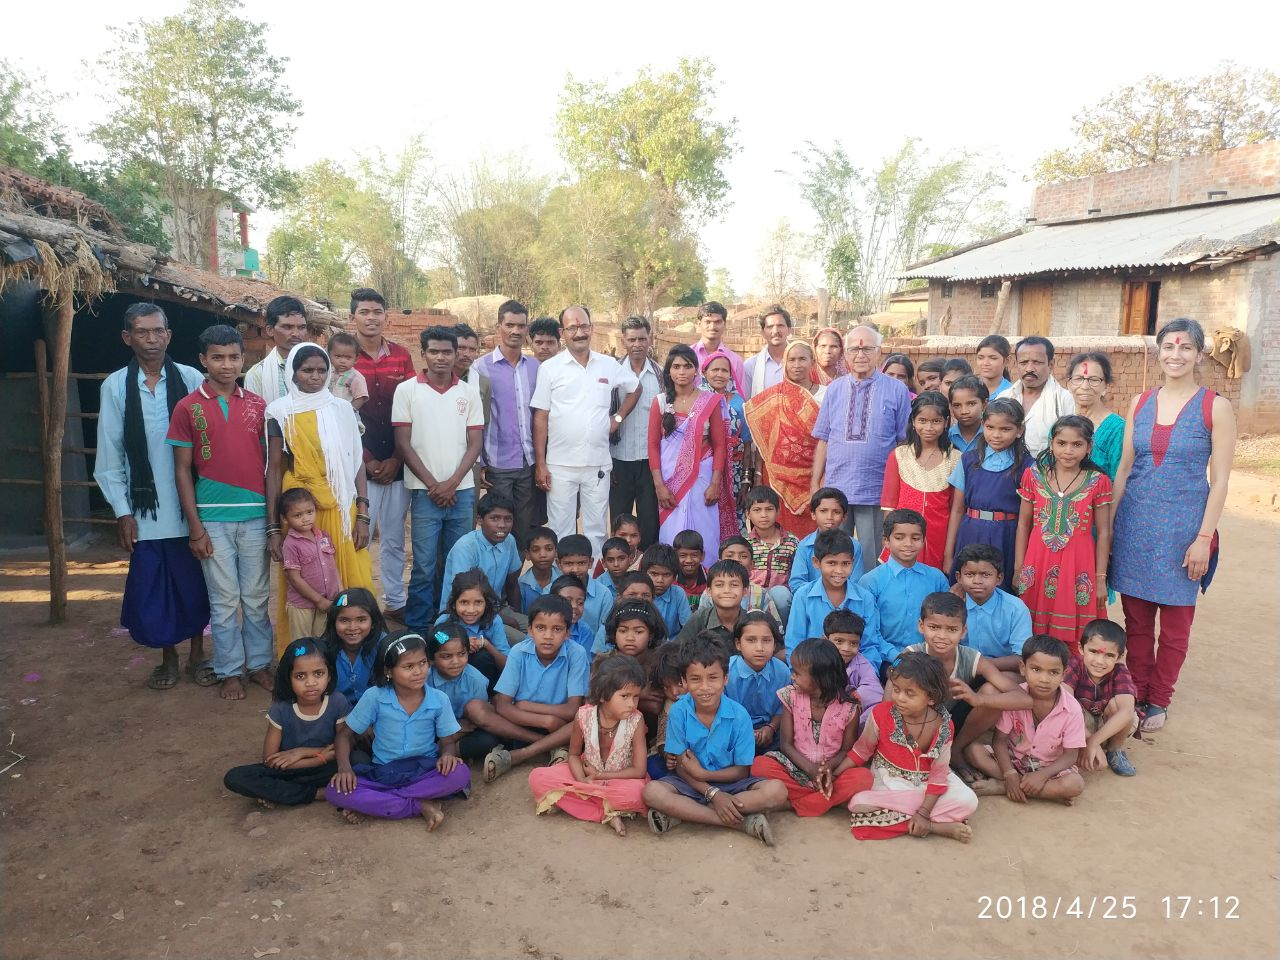 Students, families and staff at Ekal Vidyalaya in Chhattisghar, India.